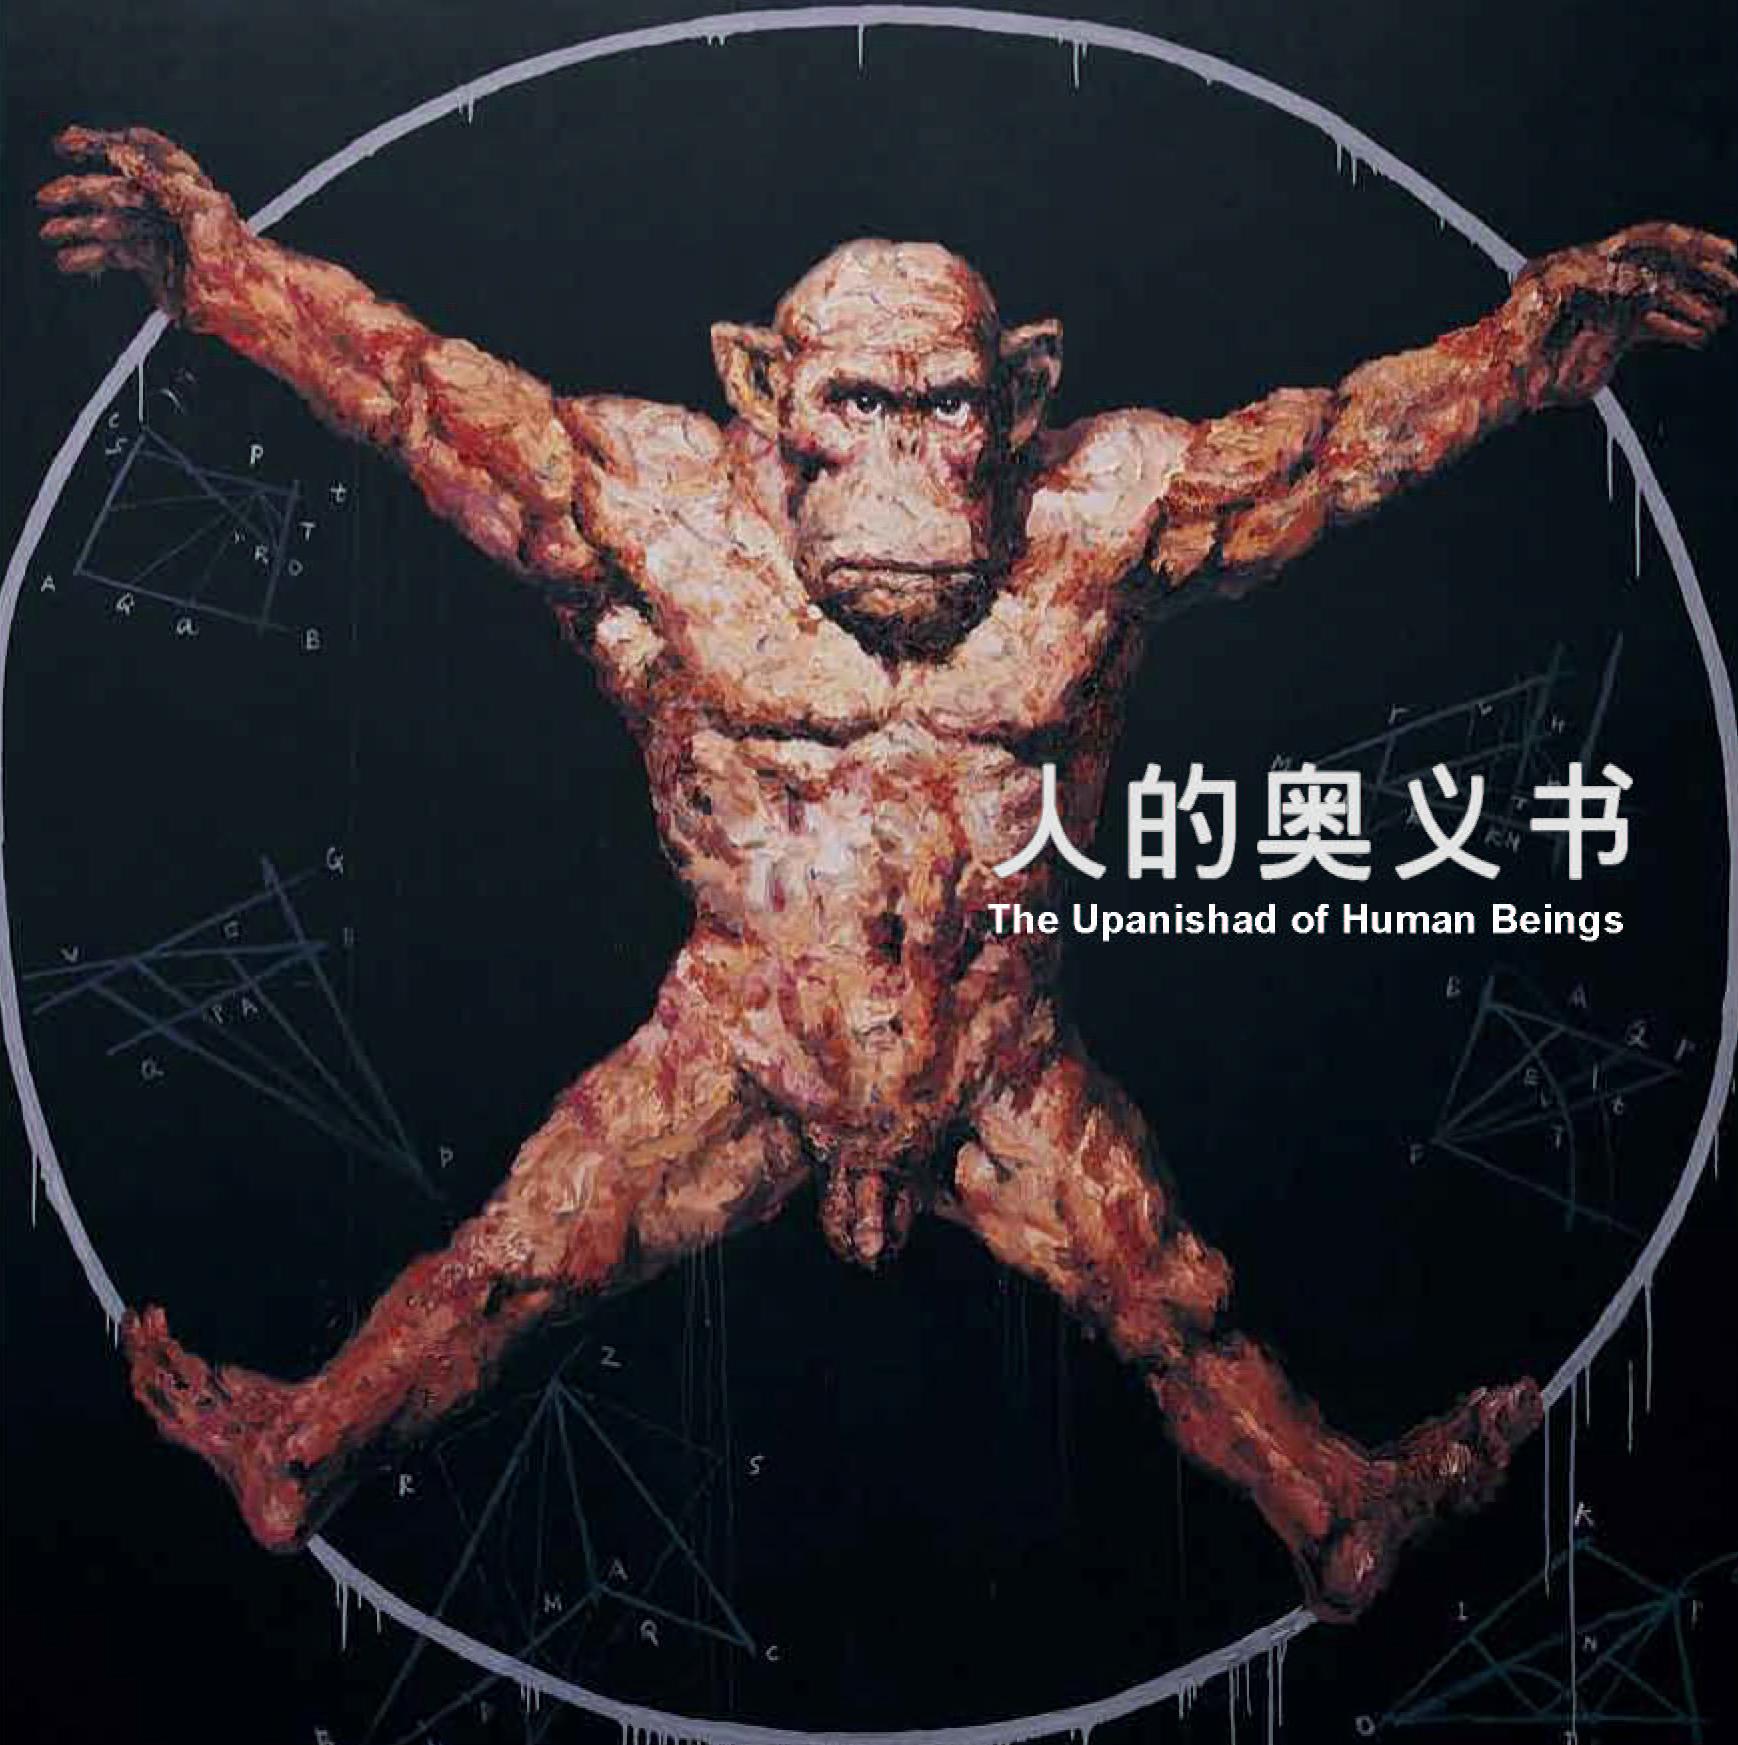 2008_7_Hua Qing_The Upanishad of Human Beings